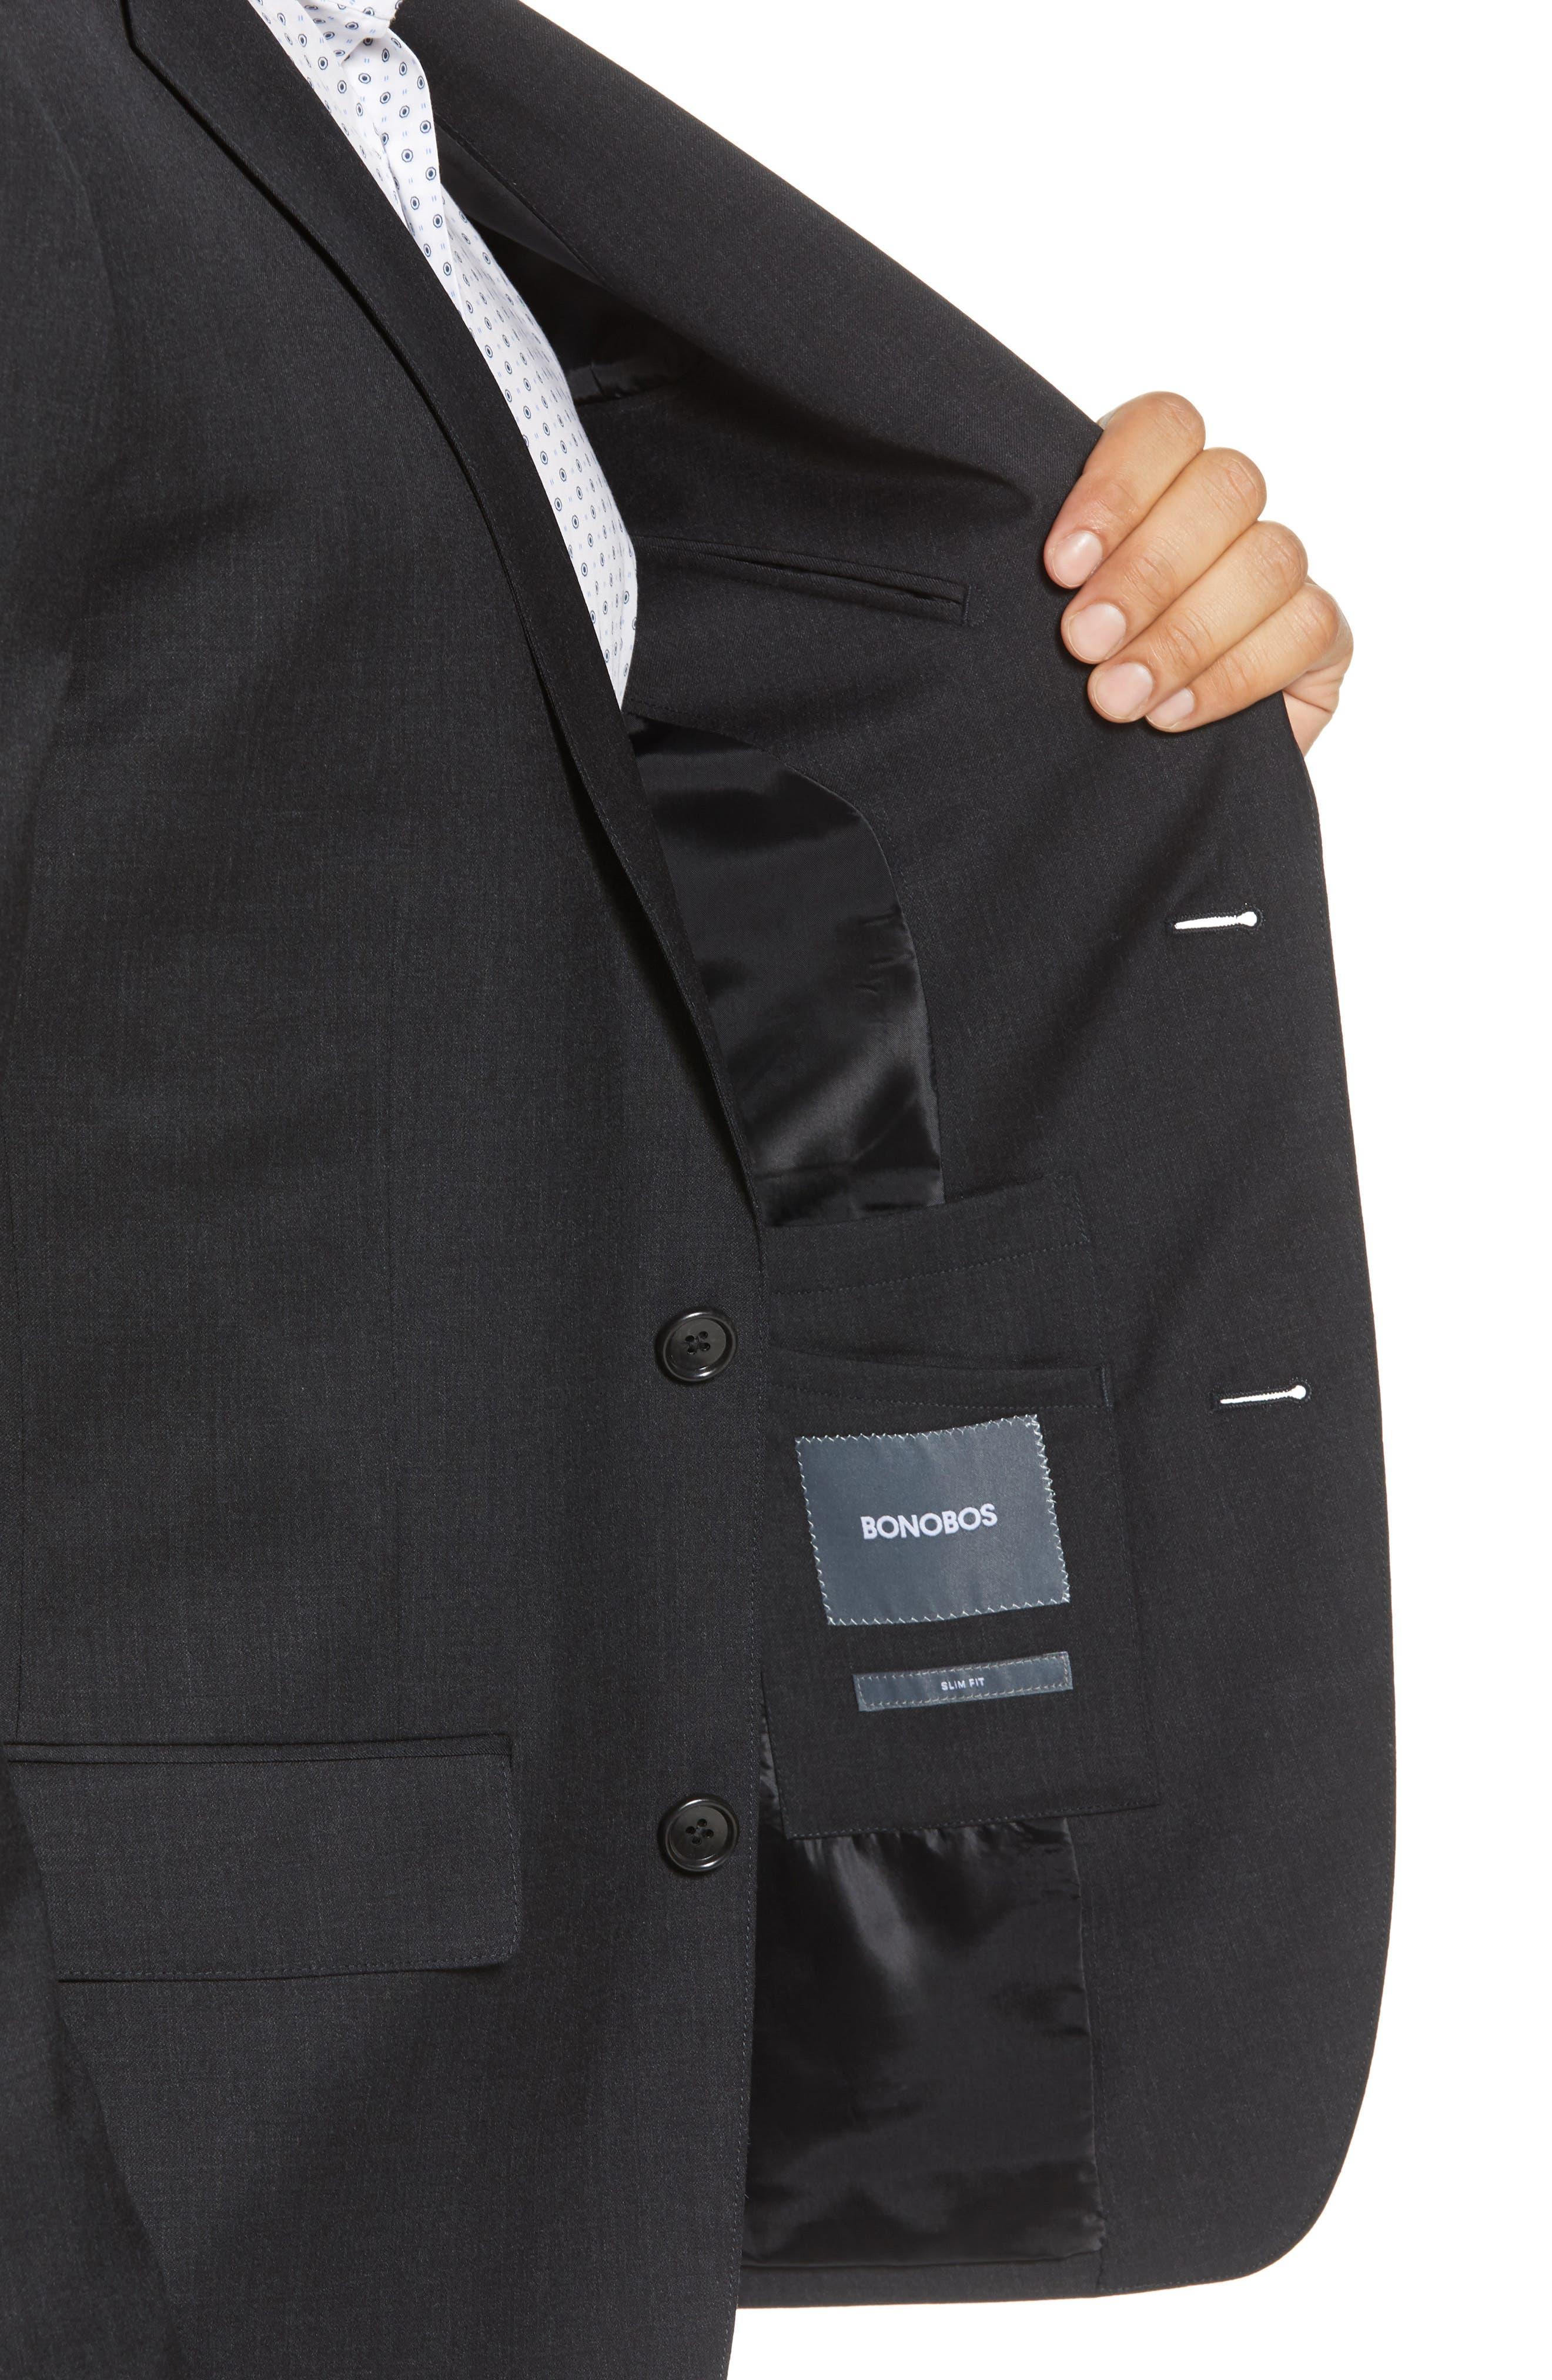 BONOBOS, Jetsetter Slim Fit Stretch Wool Blazer, Alternate thumbnail 5, color, CHARCOAL